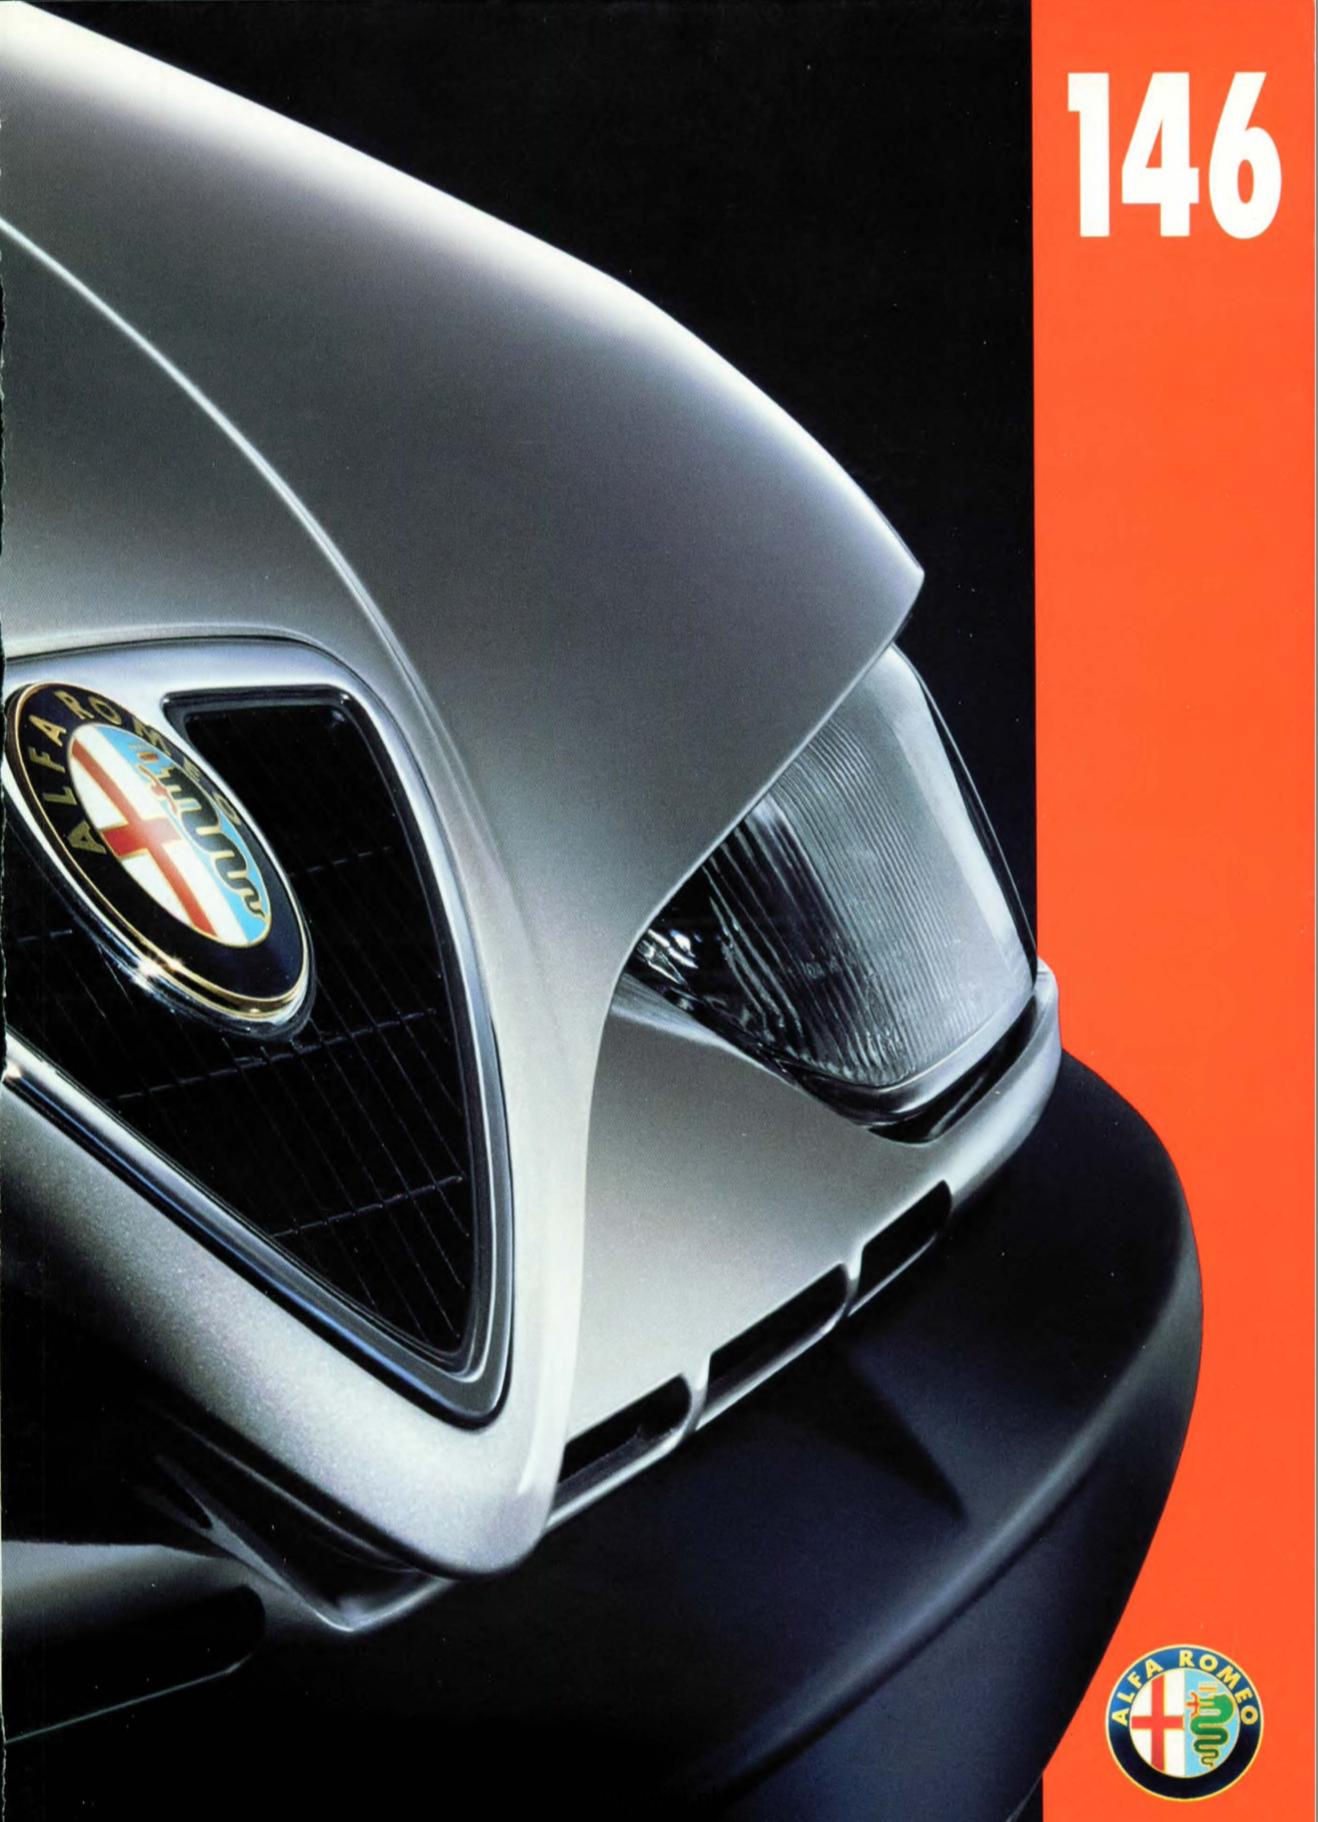 Alfa Romeo 146 brochure